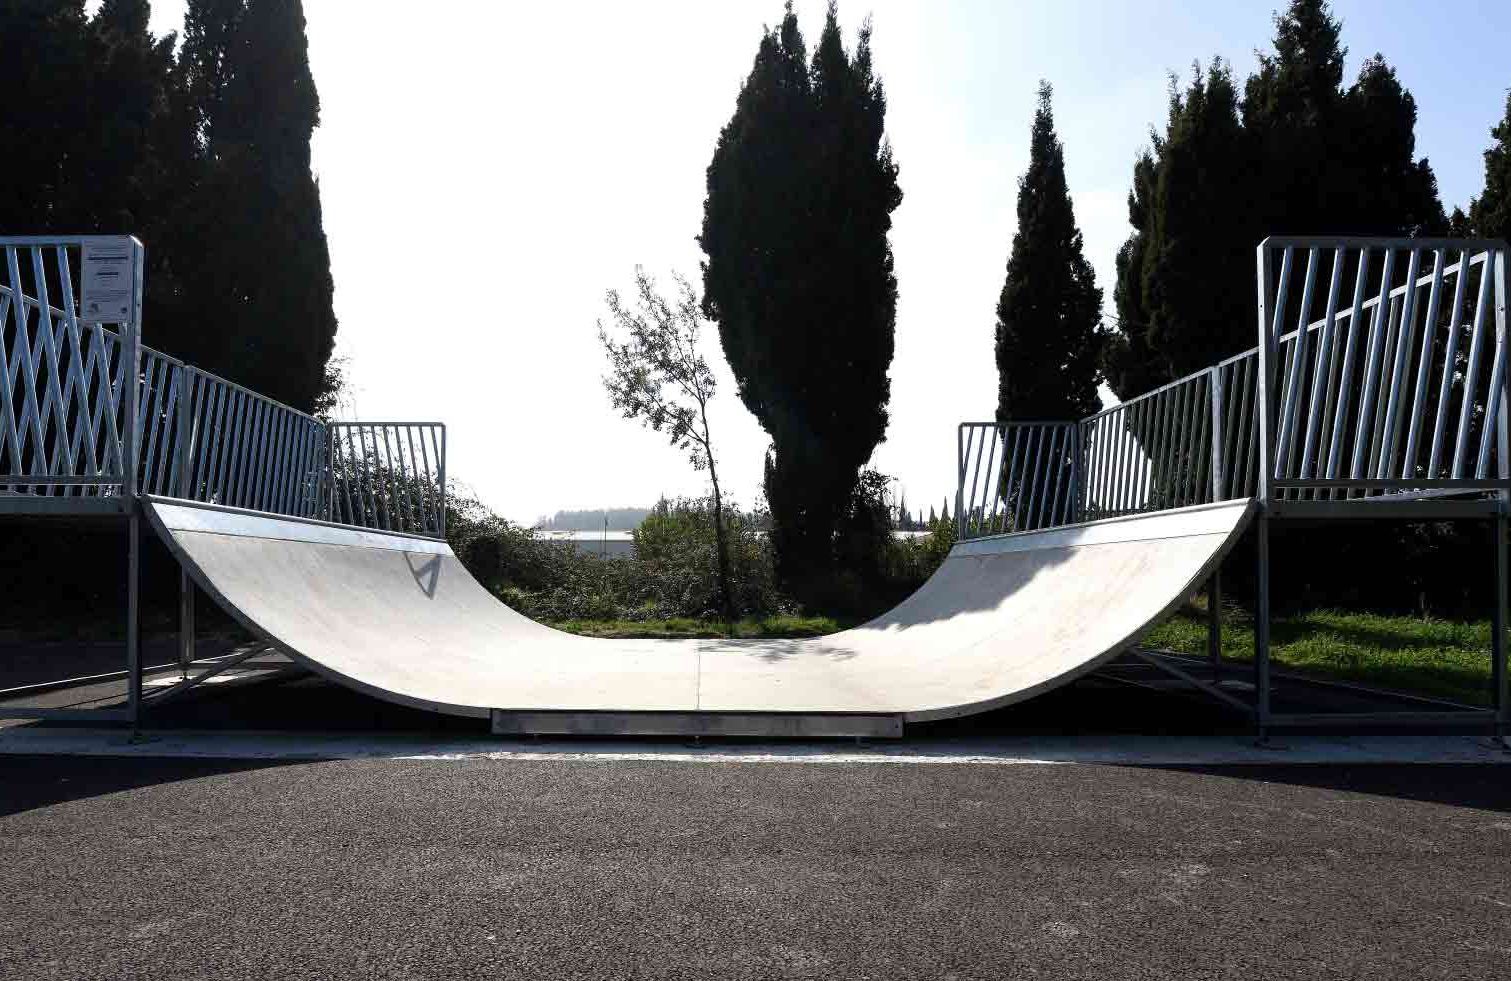 Rampe de skate-park